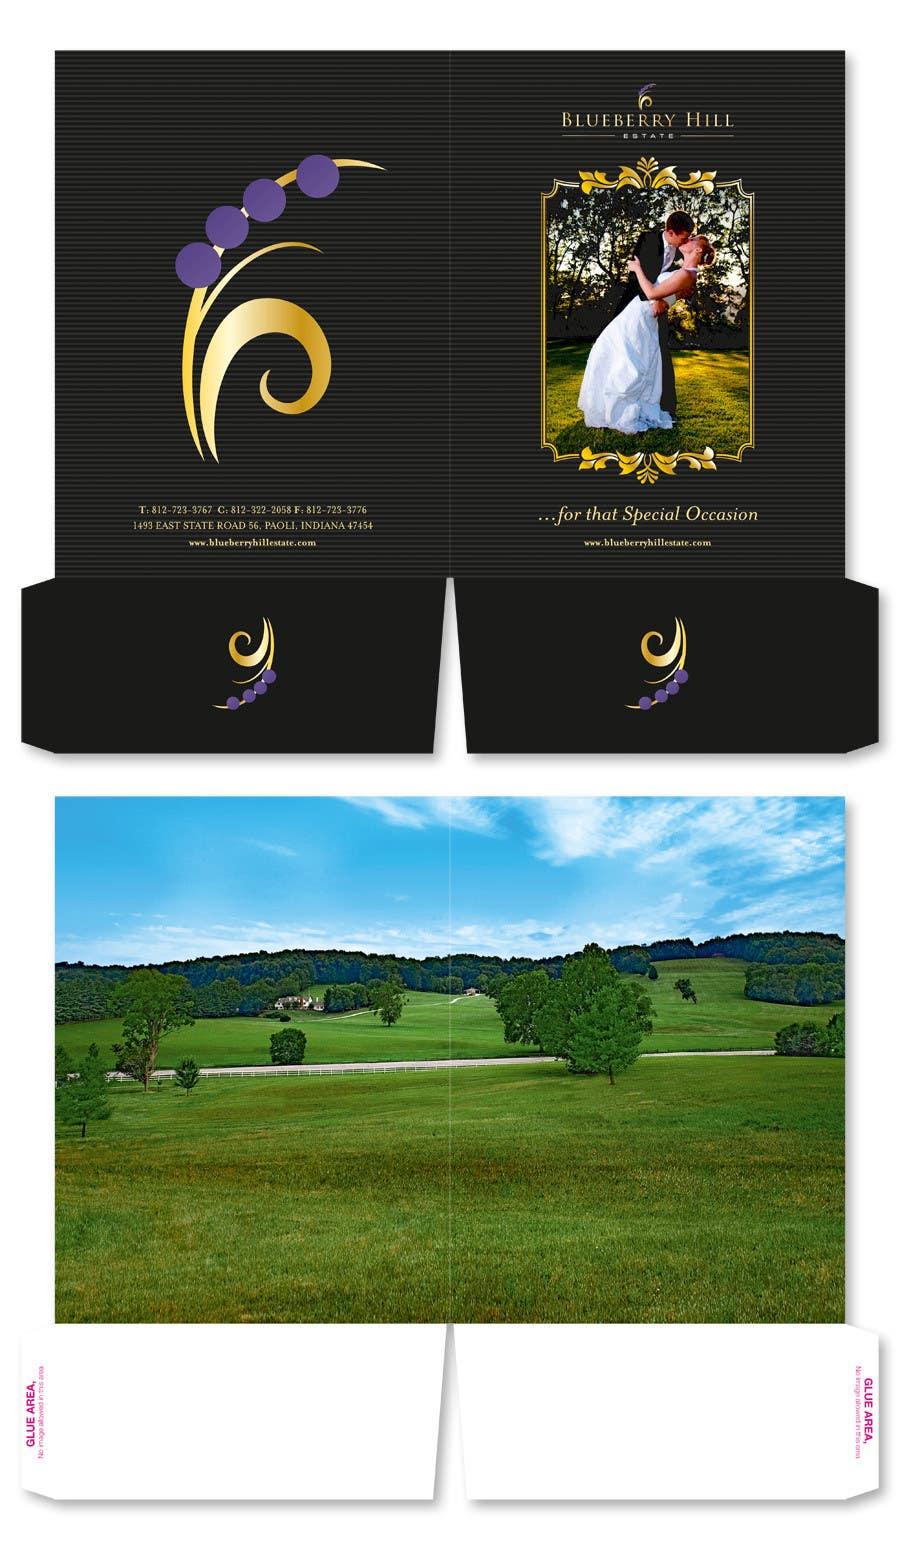 Konkurrenceindlæg #                                        61                                      for                                         Graphic Design for MARKETING BROCHURE -Blueberry Hill Estate- Wedding Specific -Media Kit for print